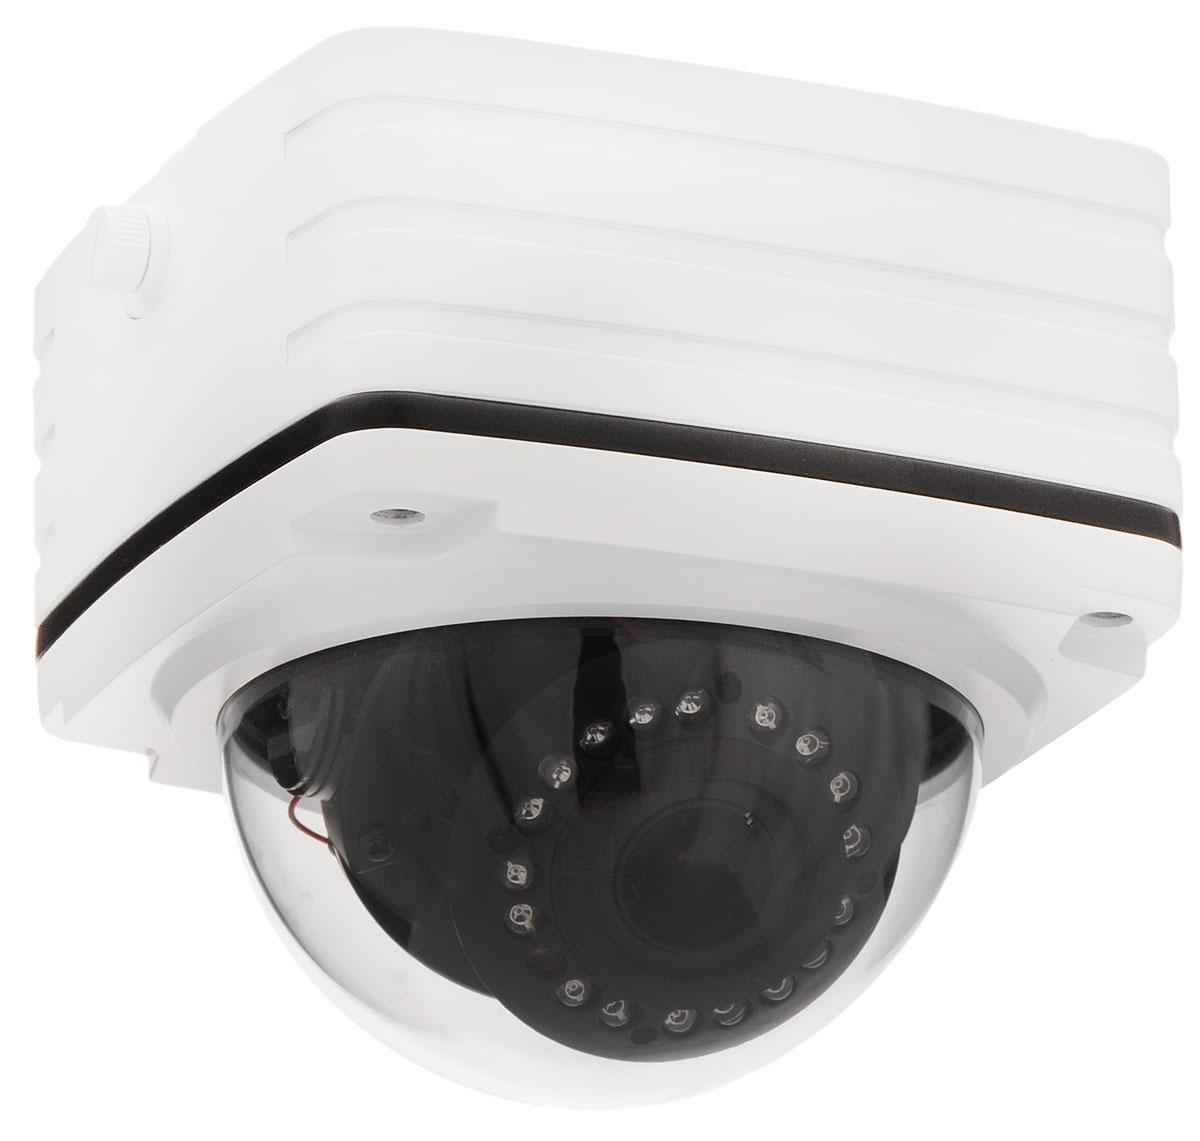 IVUE NV-431-P накладная квадратная камера видеонаблюдения